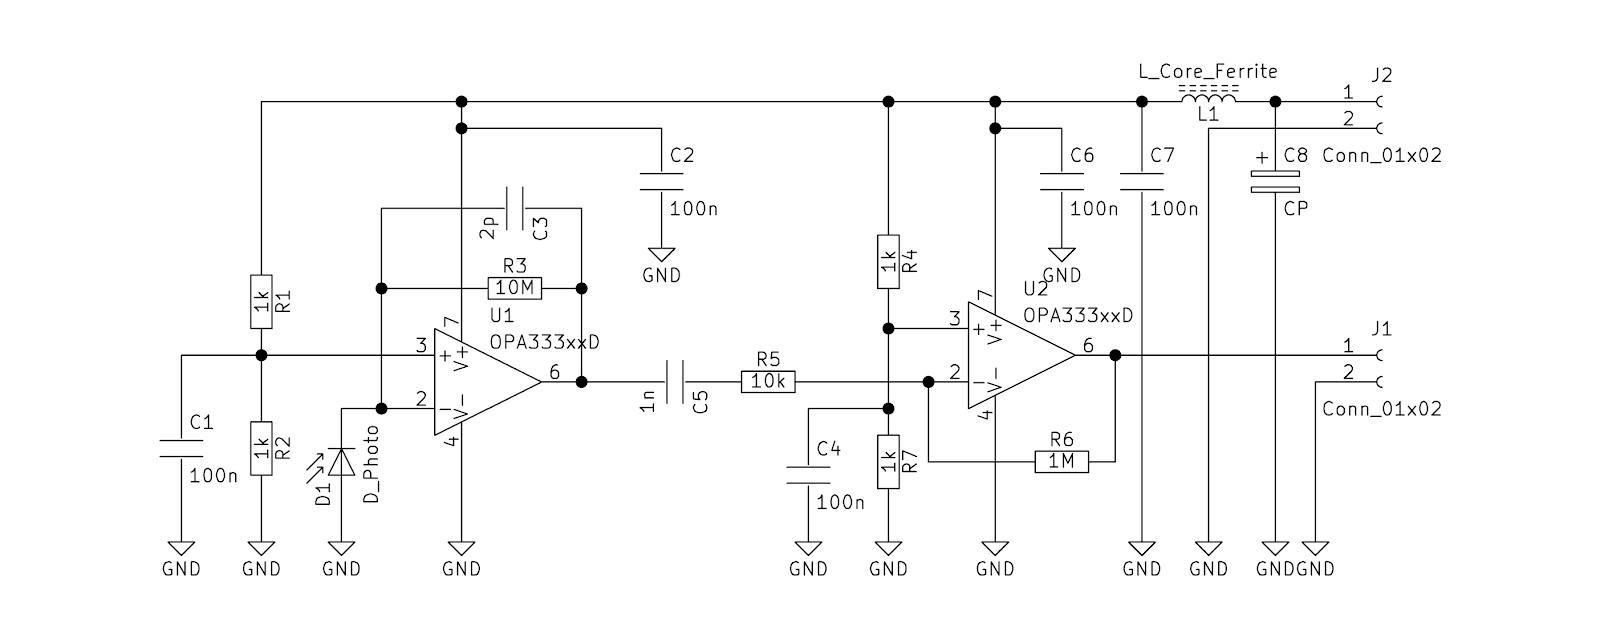 Pleasant Robert Gawron Semiconductor Nuclear Radiation Sensor Part Ii Wiring Database Apannorabwedabyuccorg